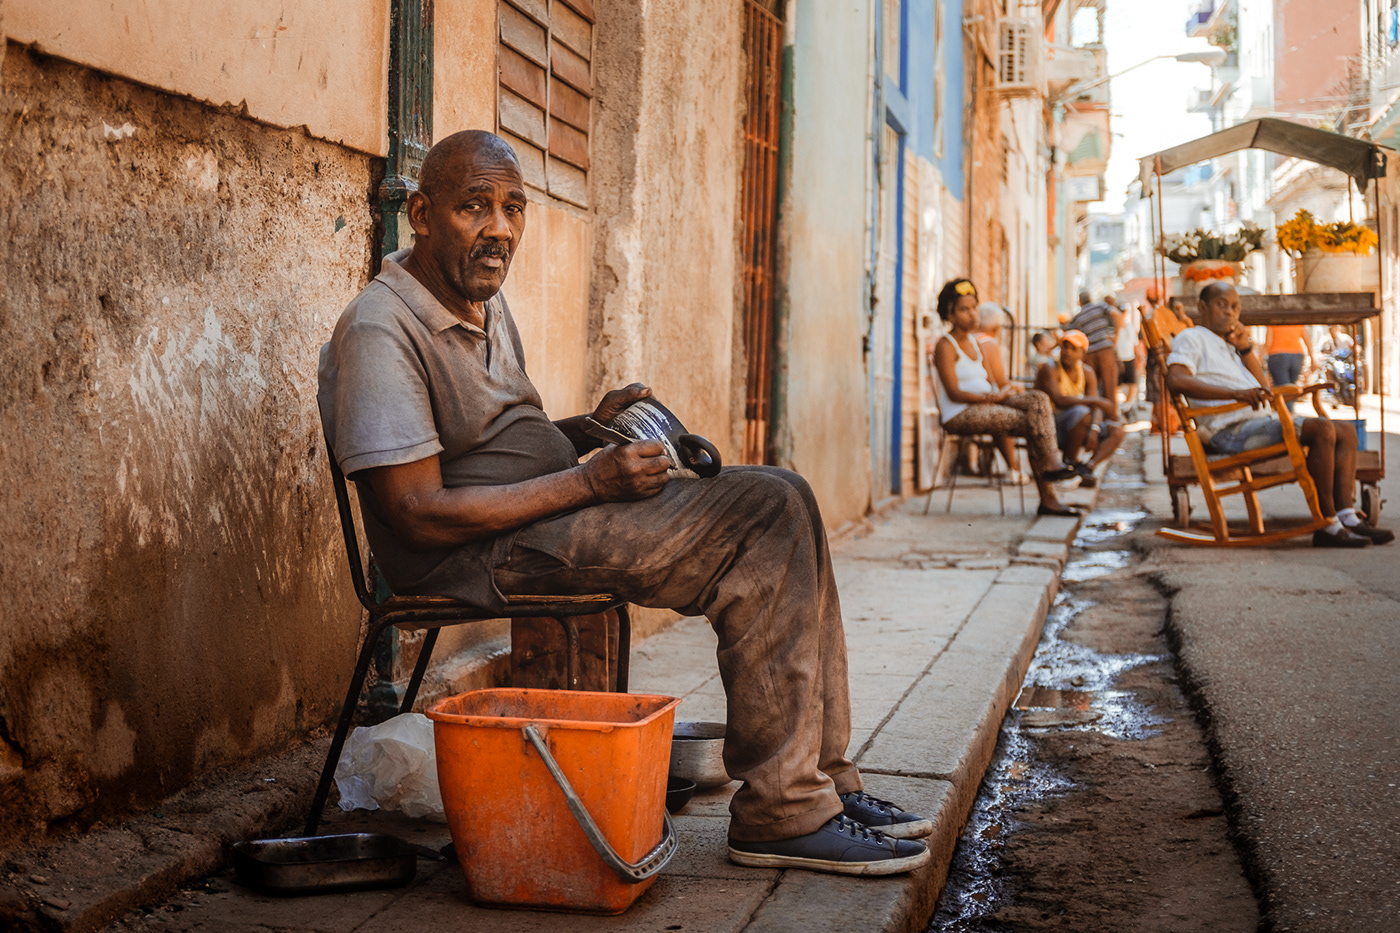 color cuba Documentry Havanna Island people Street street photography streetlife